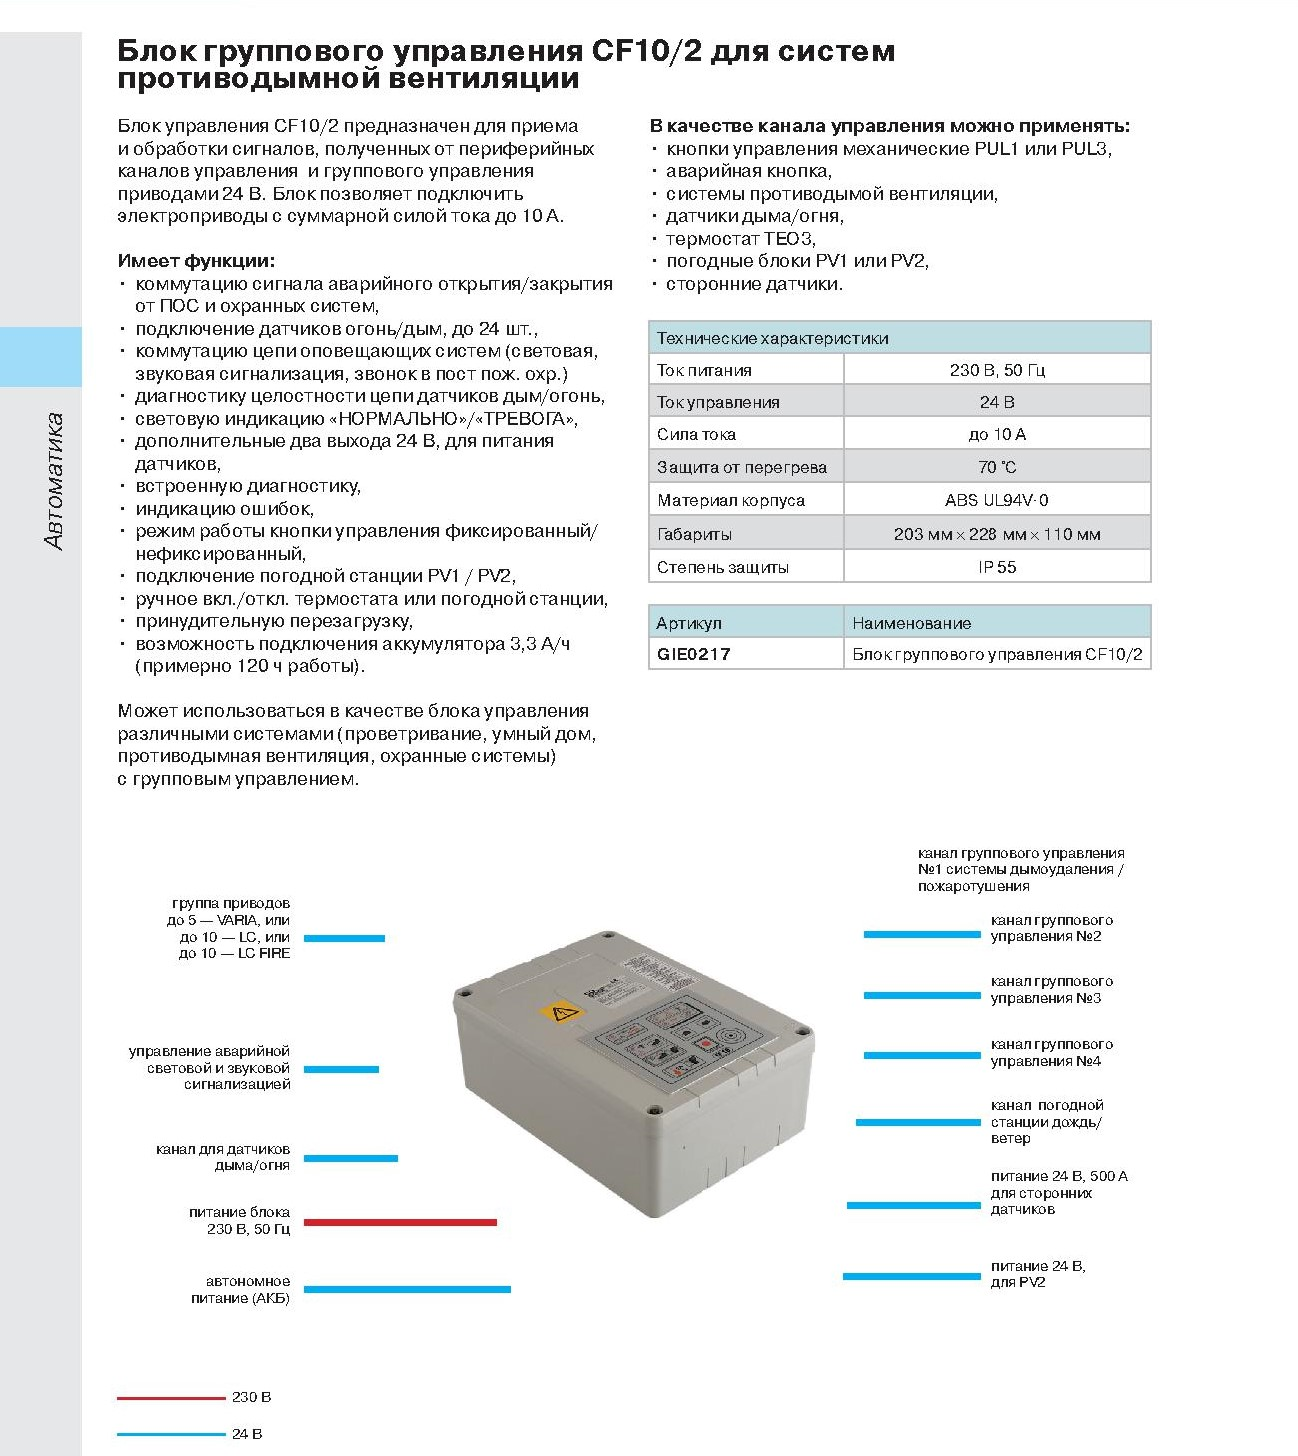 CV 10-2